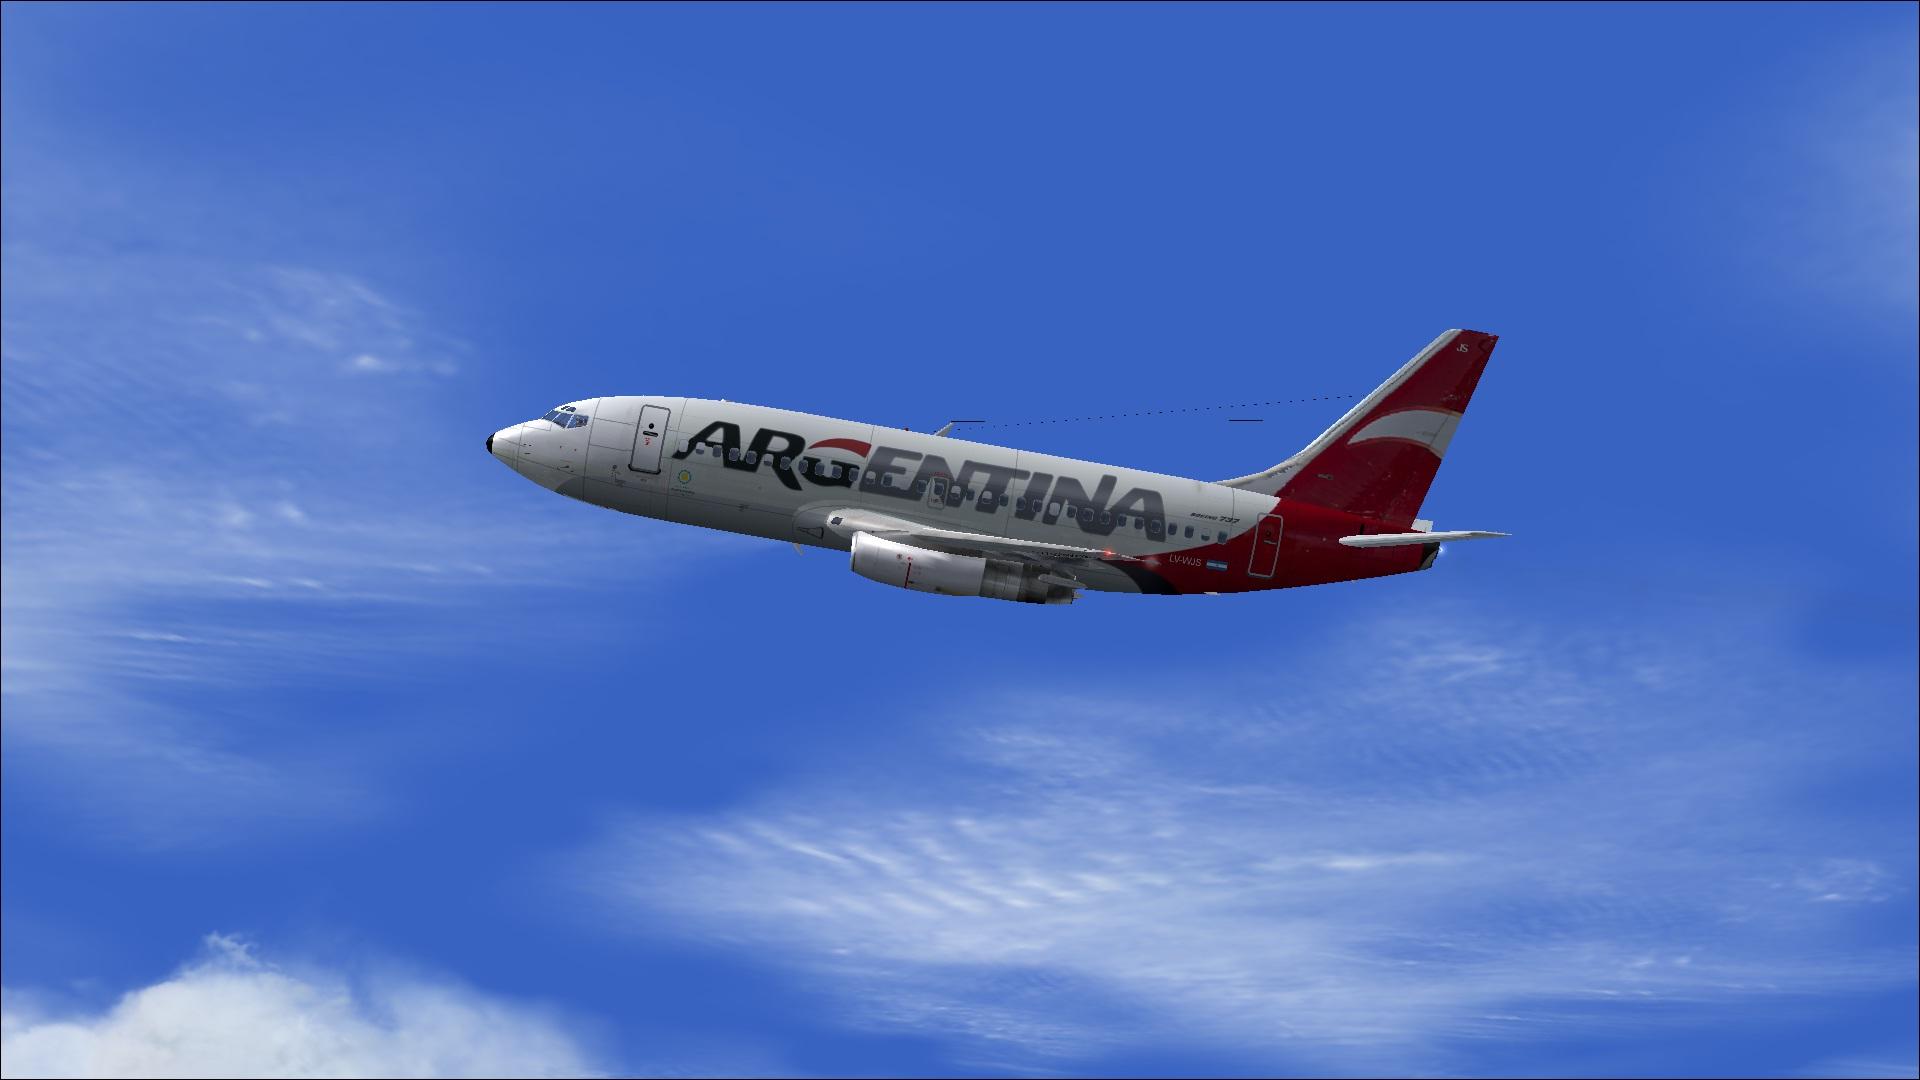 fs-freeware net - FS2004 Boeing 737-200, ARG Lineas Privadas